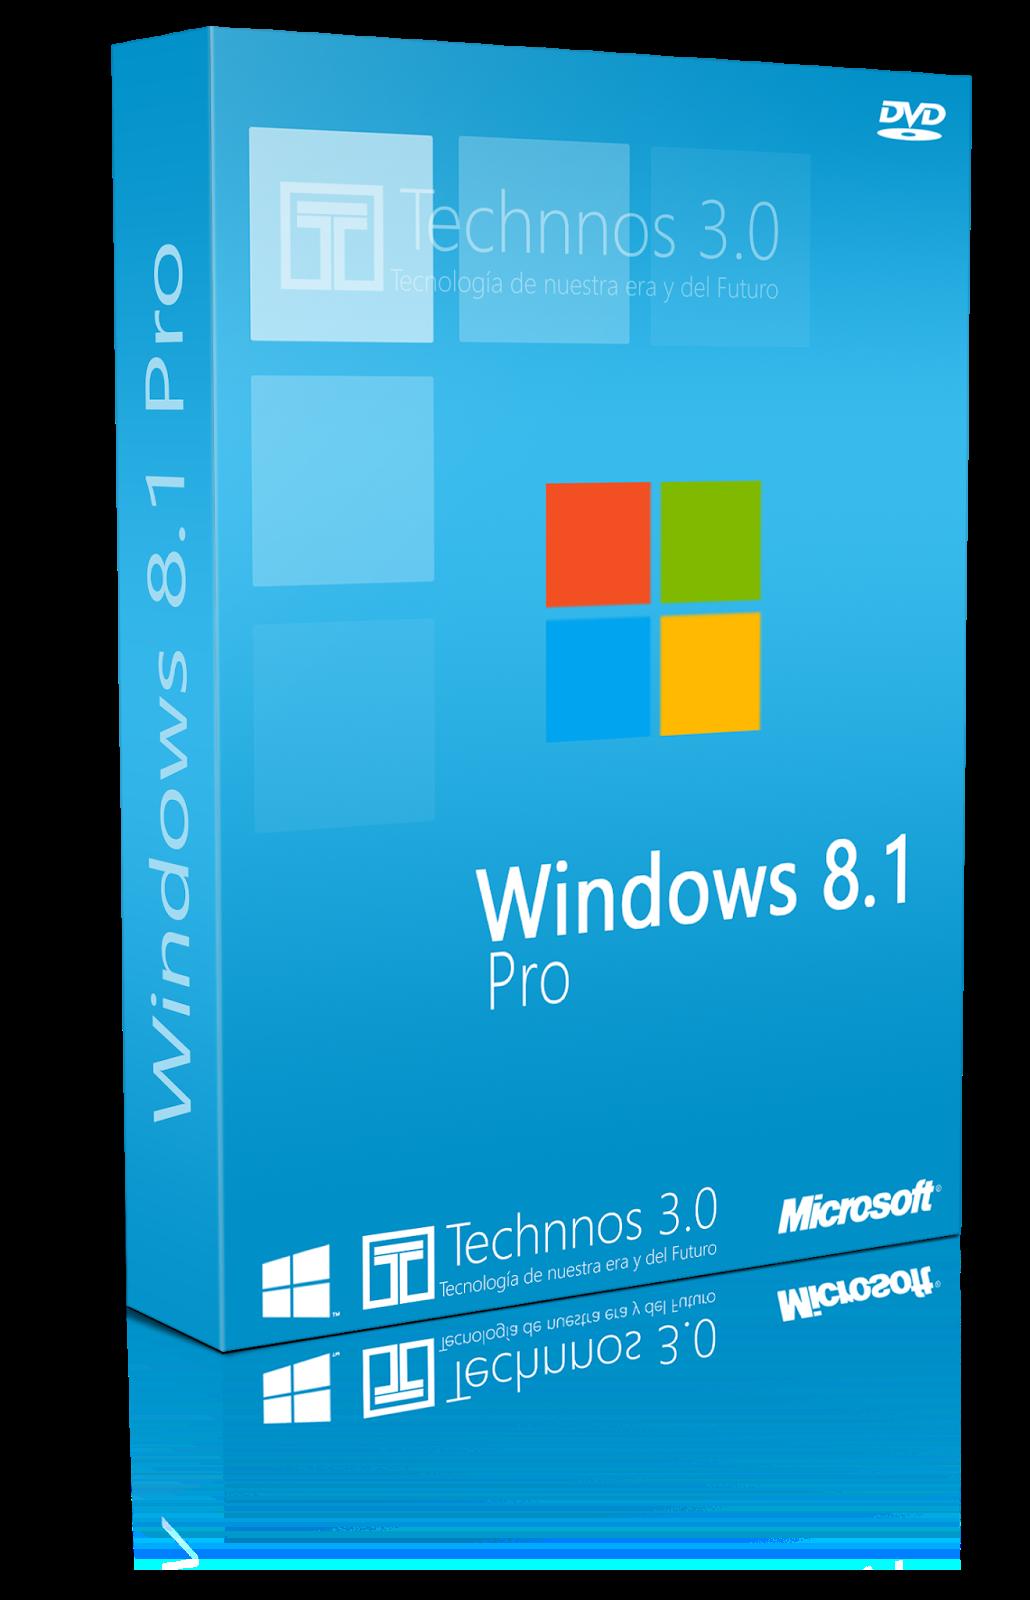 activador de windows 8.1 enterprise 64 bits